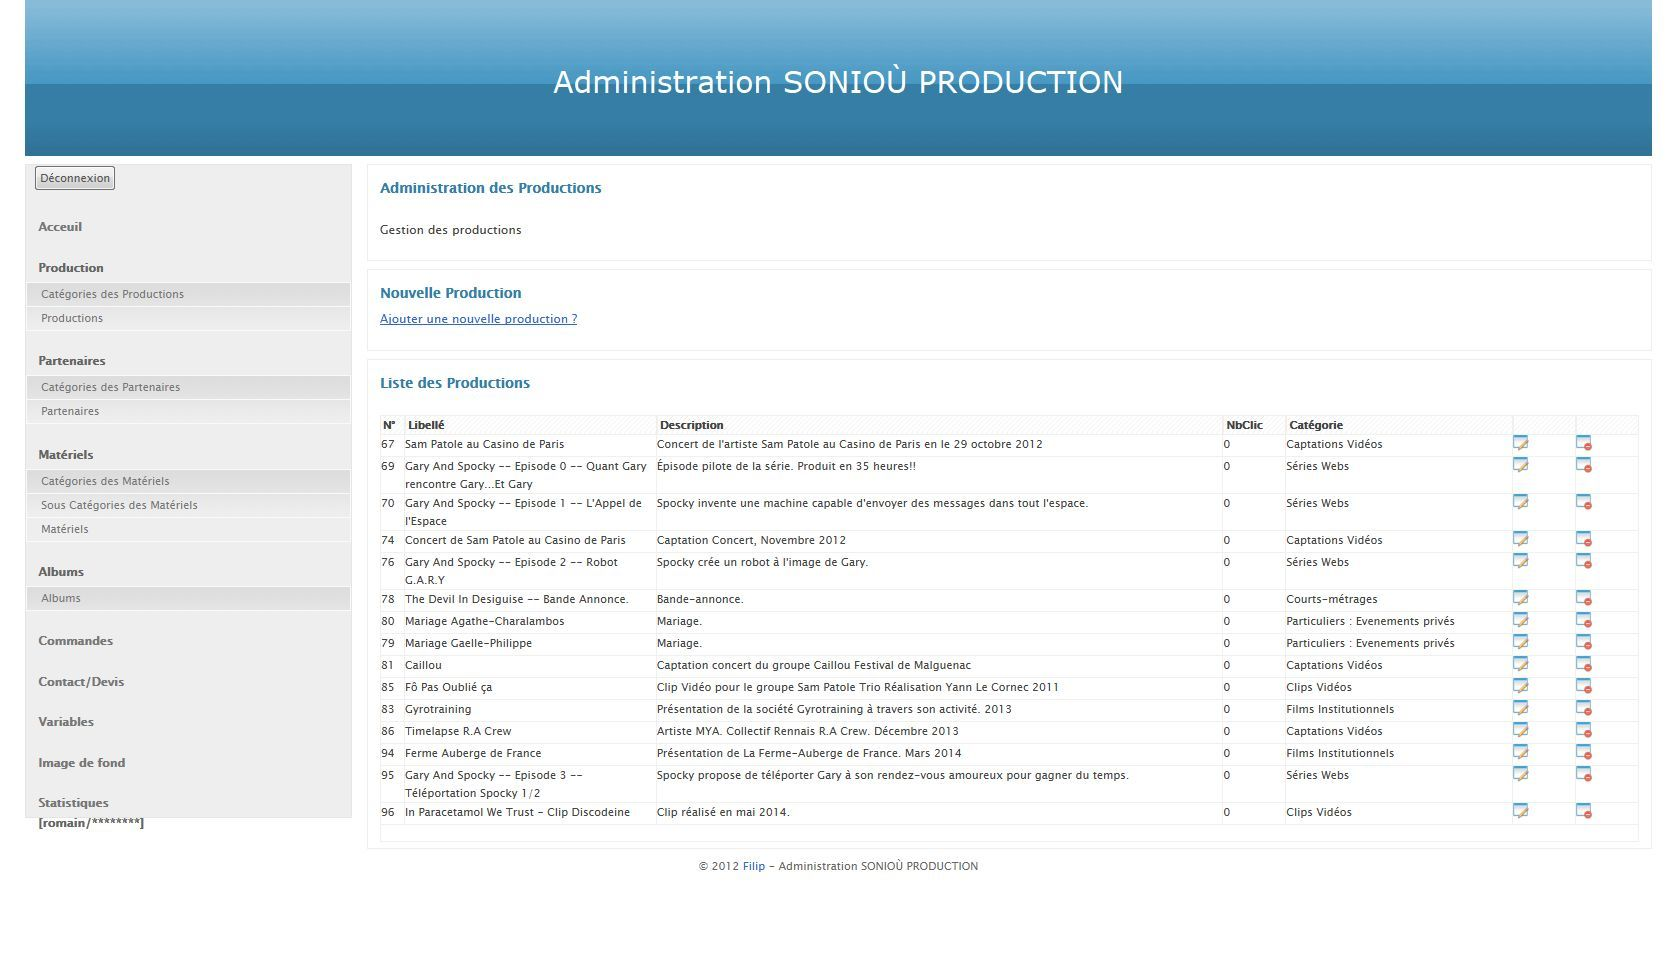 Sonioù Production